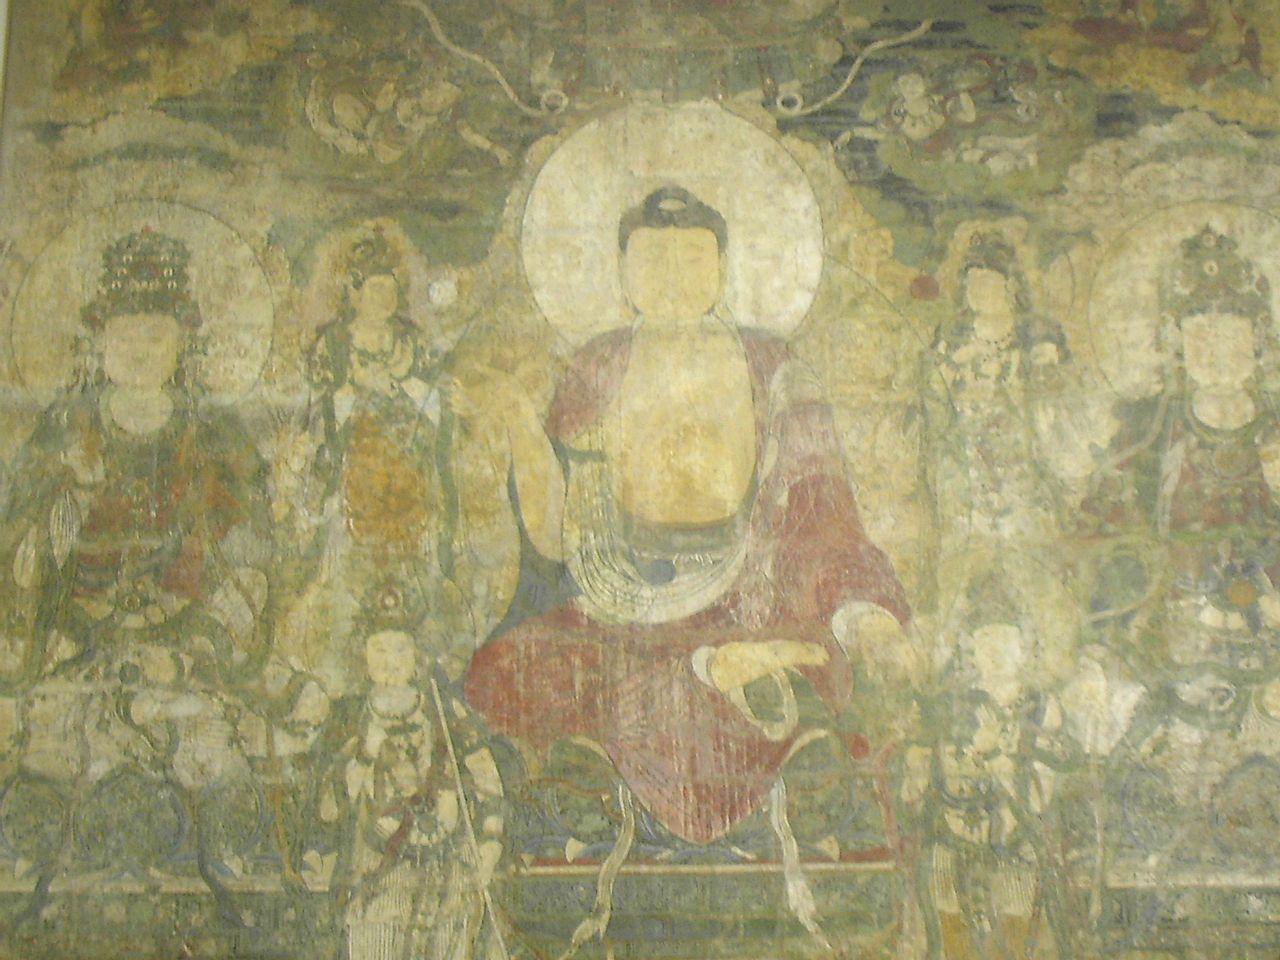 FilePure Land of Bhaisajyaguru Yuan DynastyJPG  Wikipedia